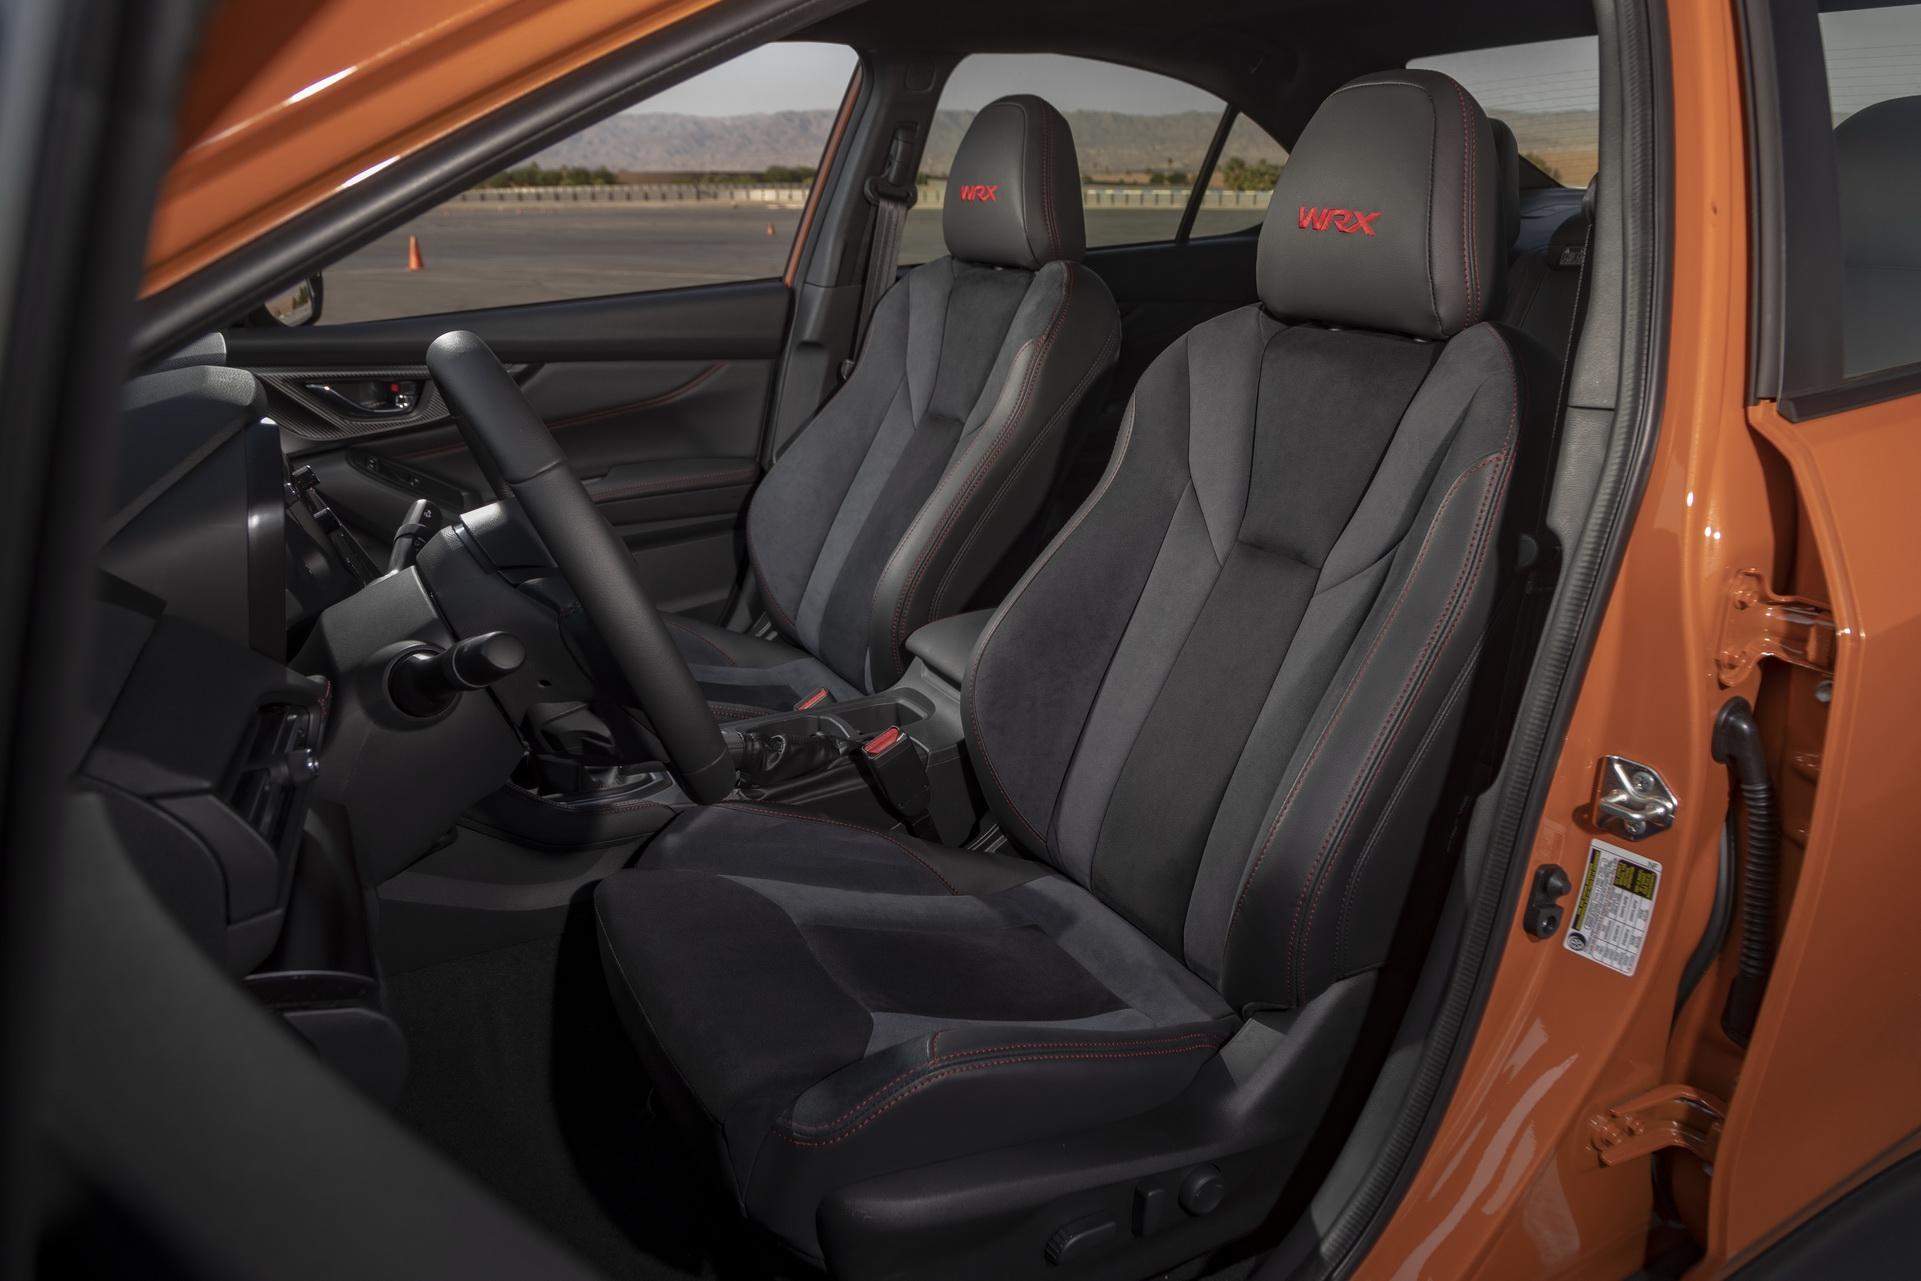 2022 Subaru WRX Interior Front Seats Wallpapers #25 of 61